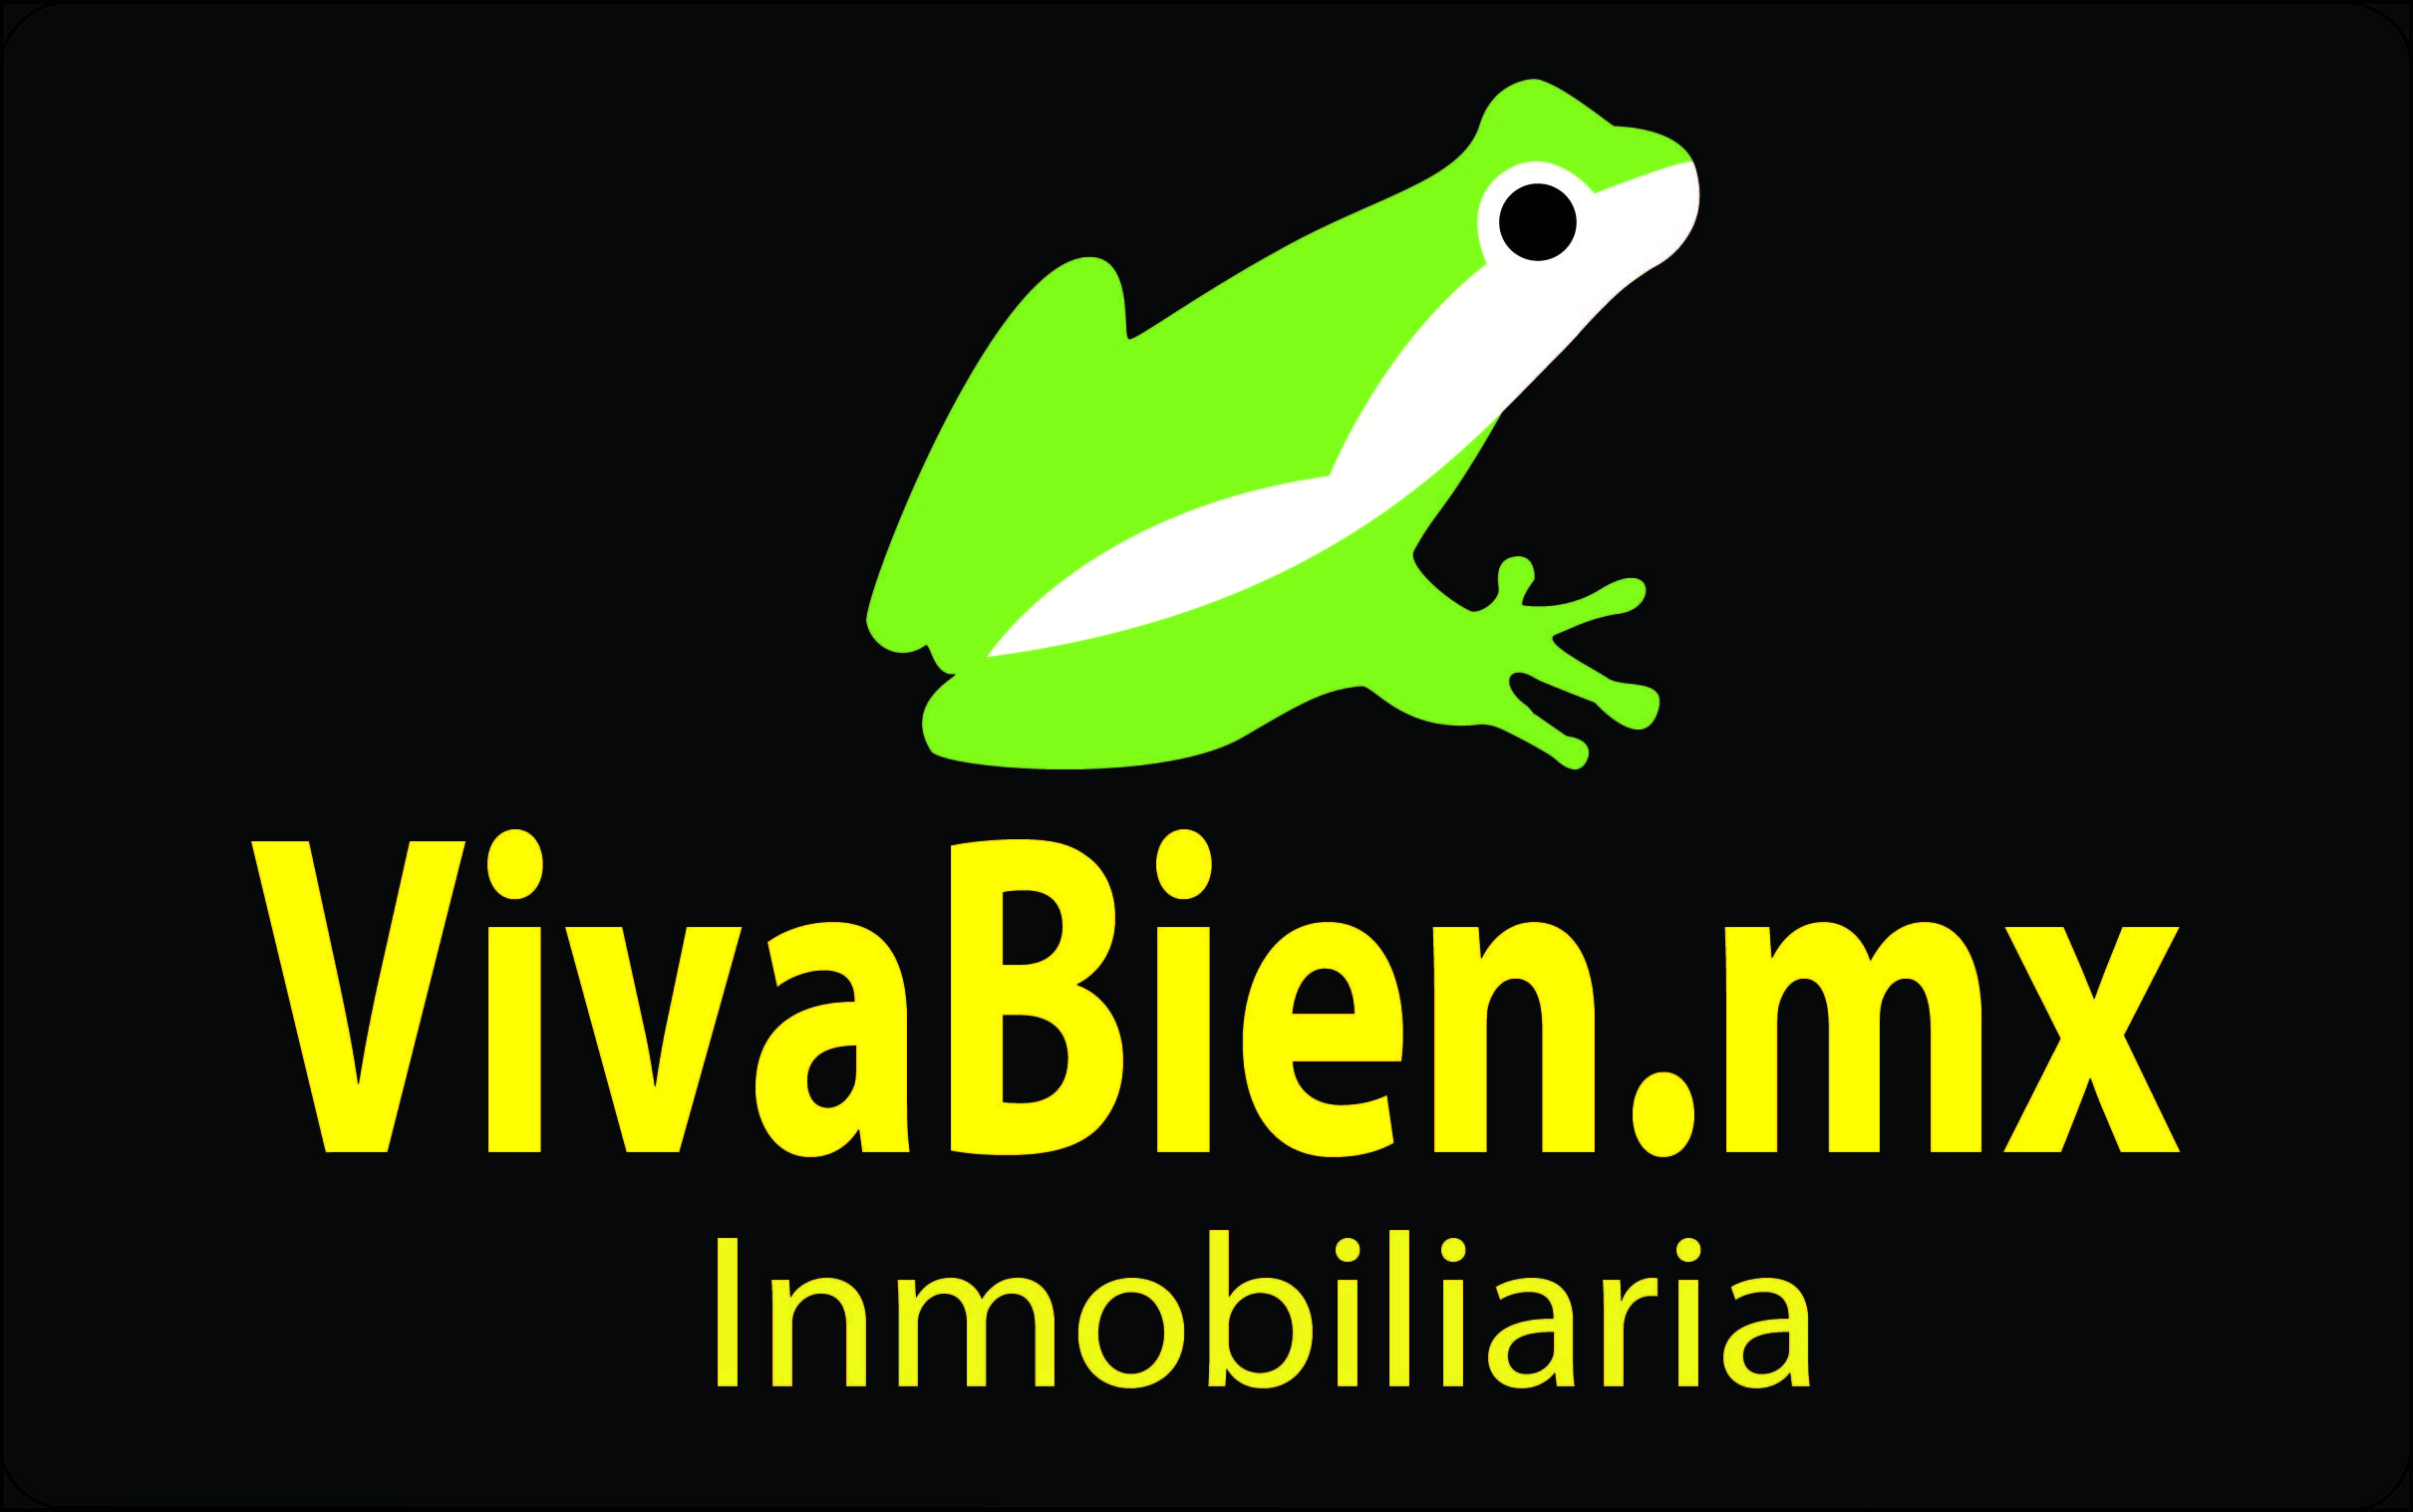 logo_VivaBien_Inmobiliaria_easy_broker.jpg